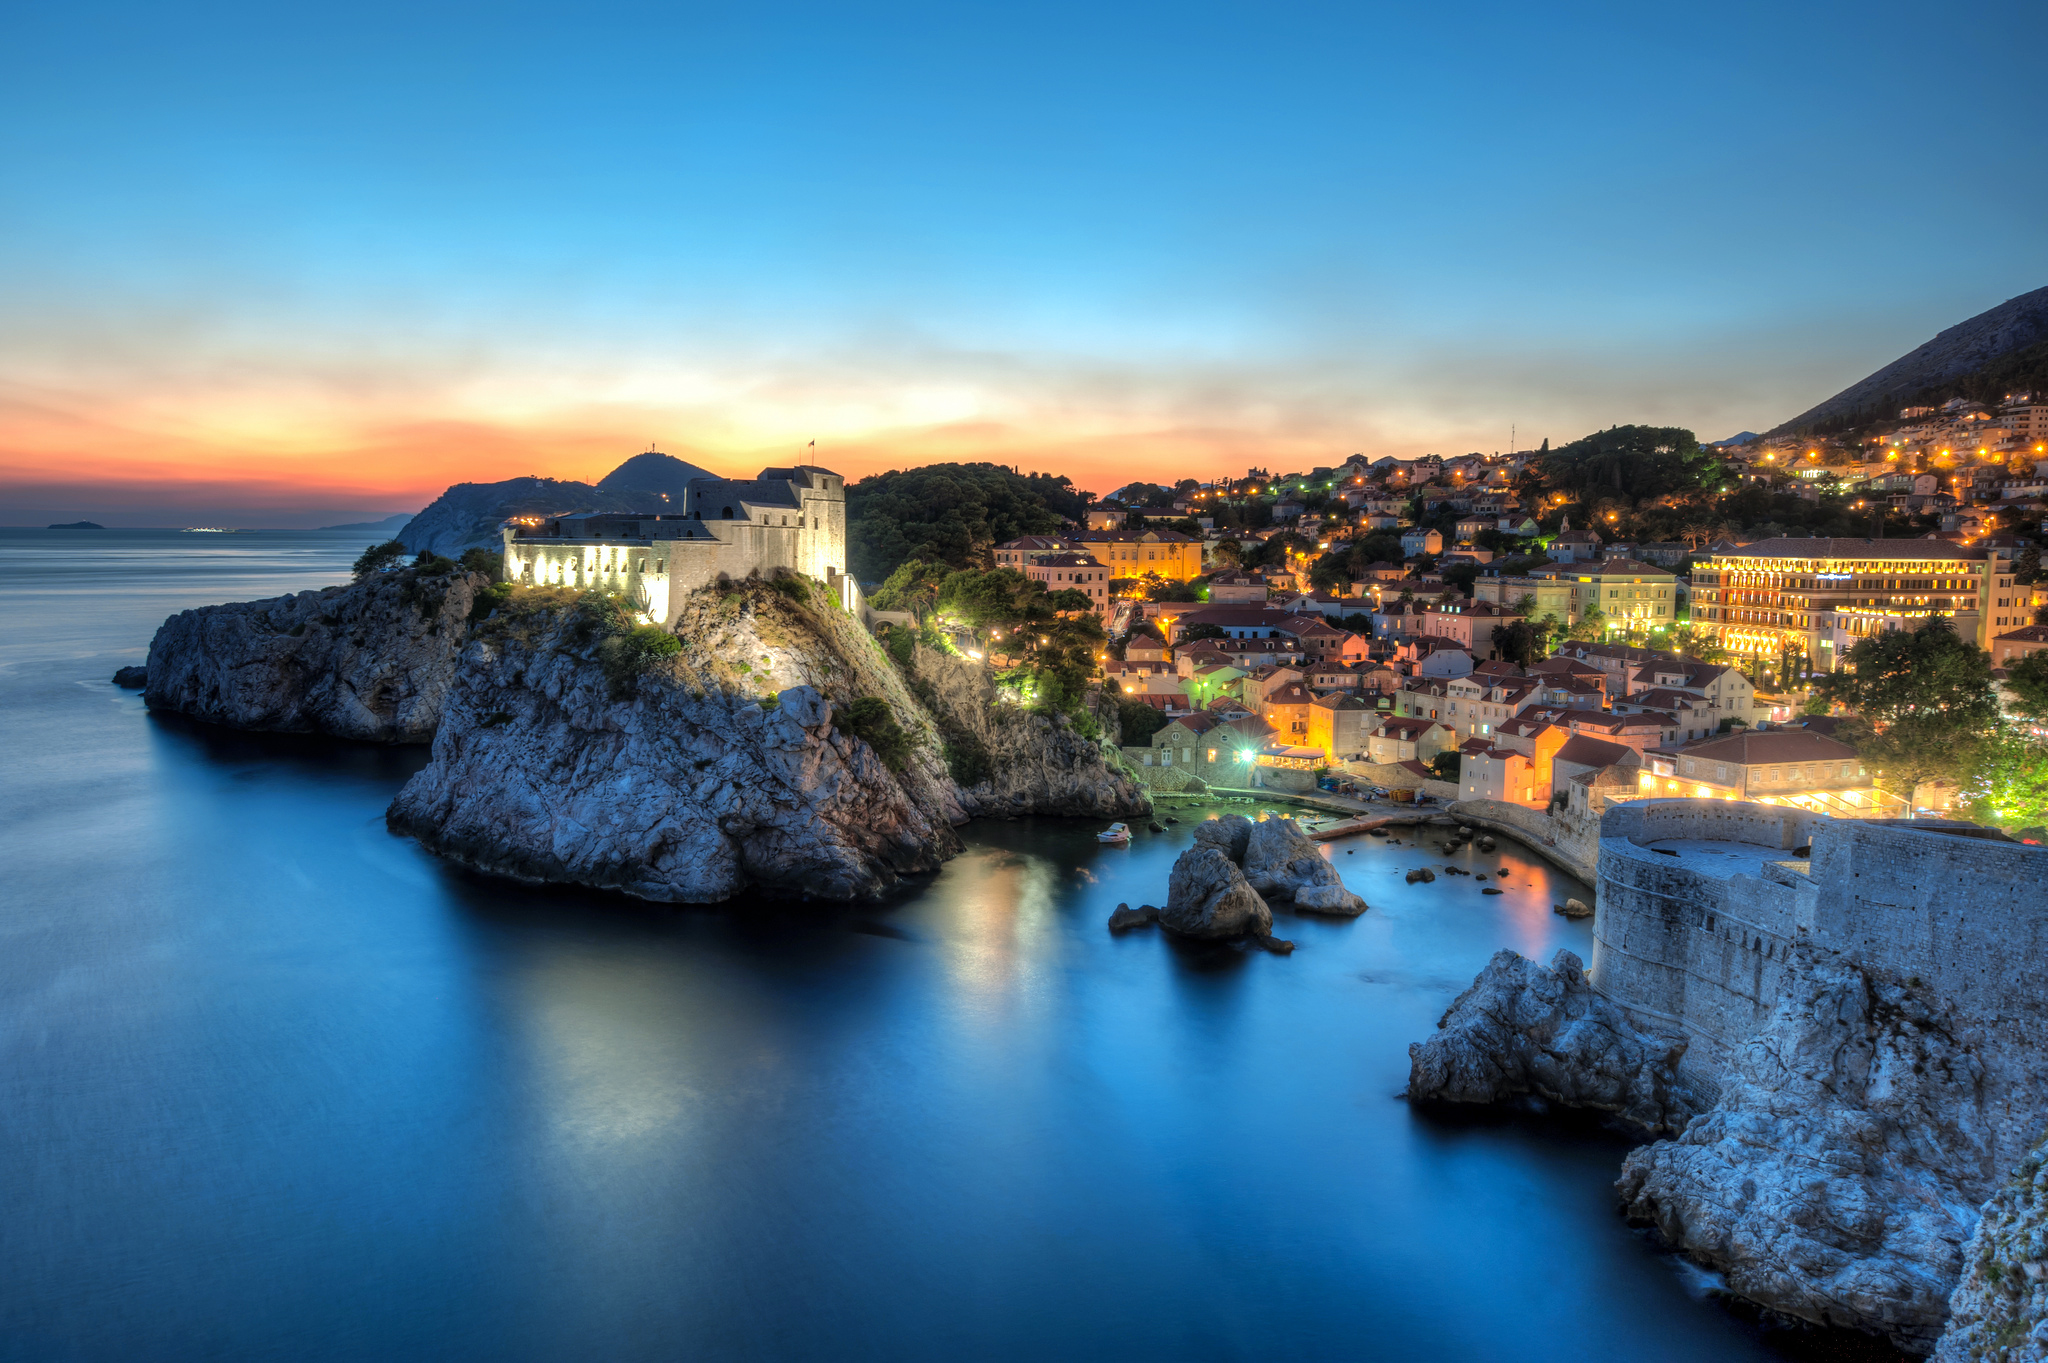 хорватия, море, вечер